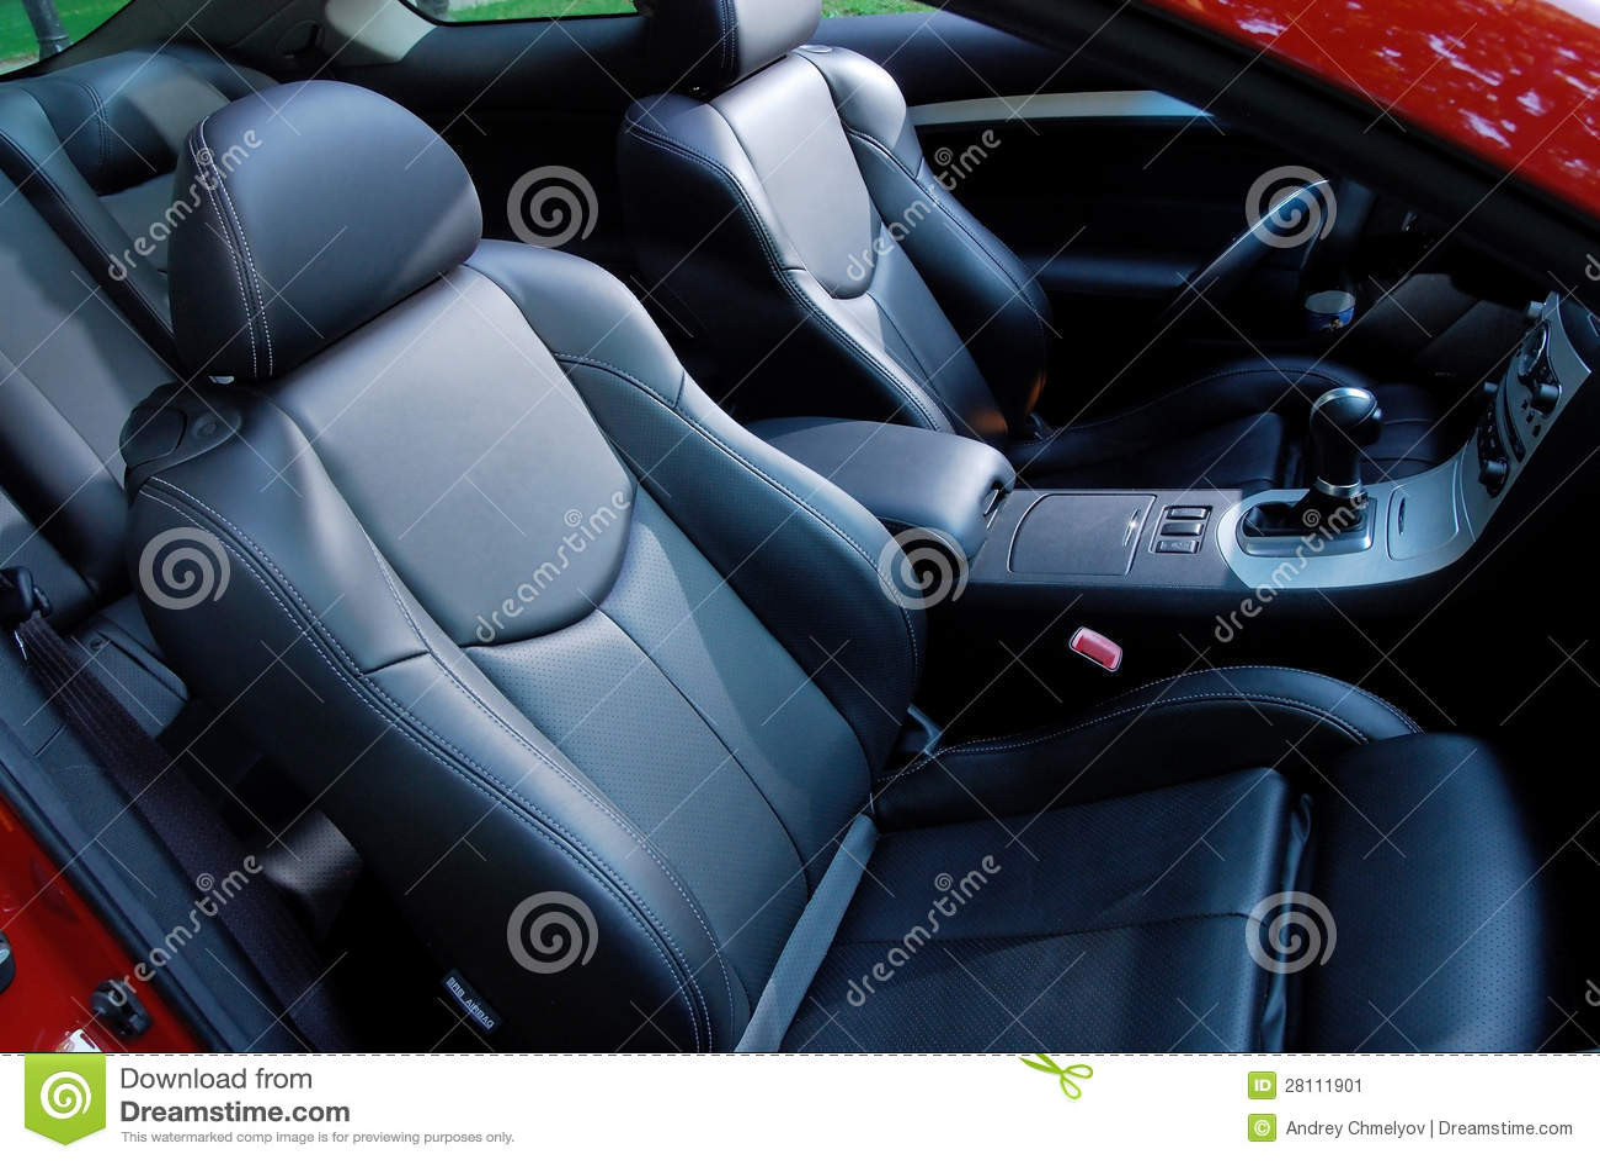 car interior stock photo 55063776. Black Bedroom Furniture Sets. Home Design Ideas